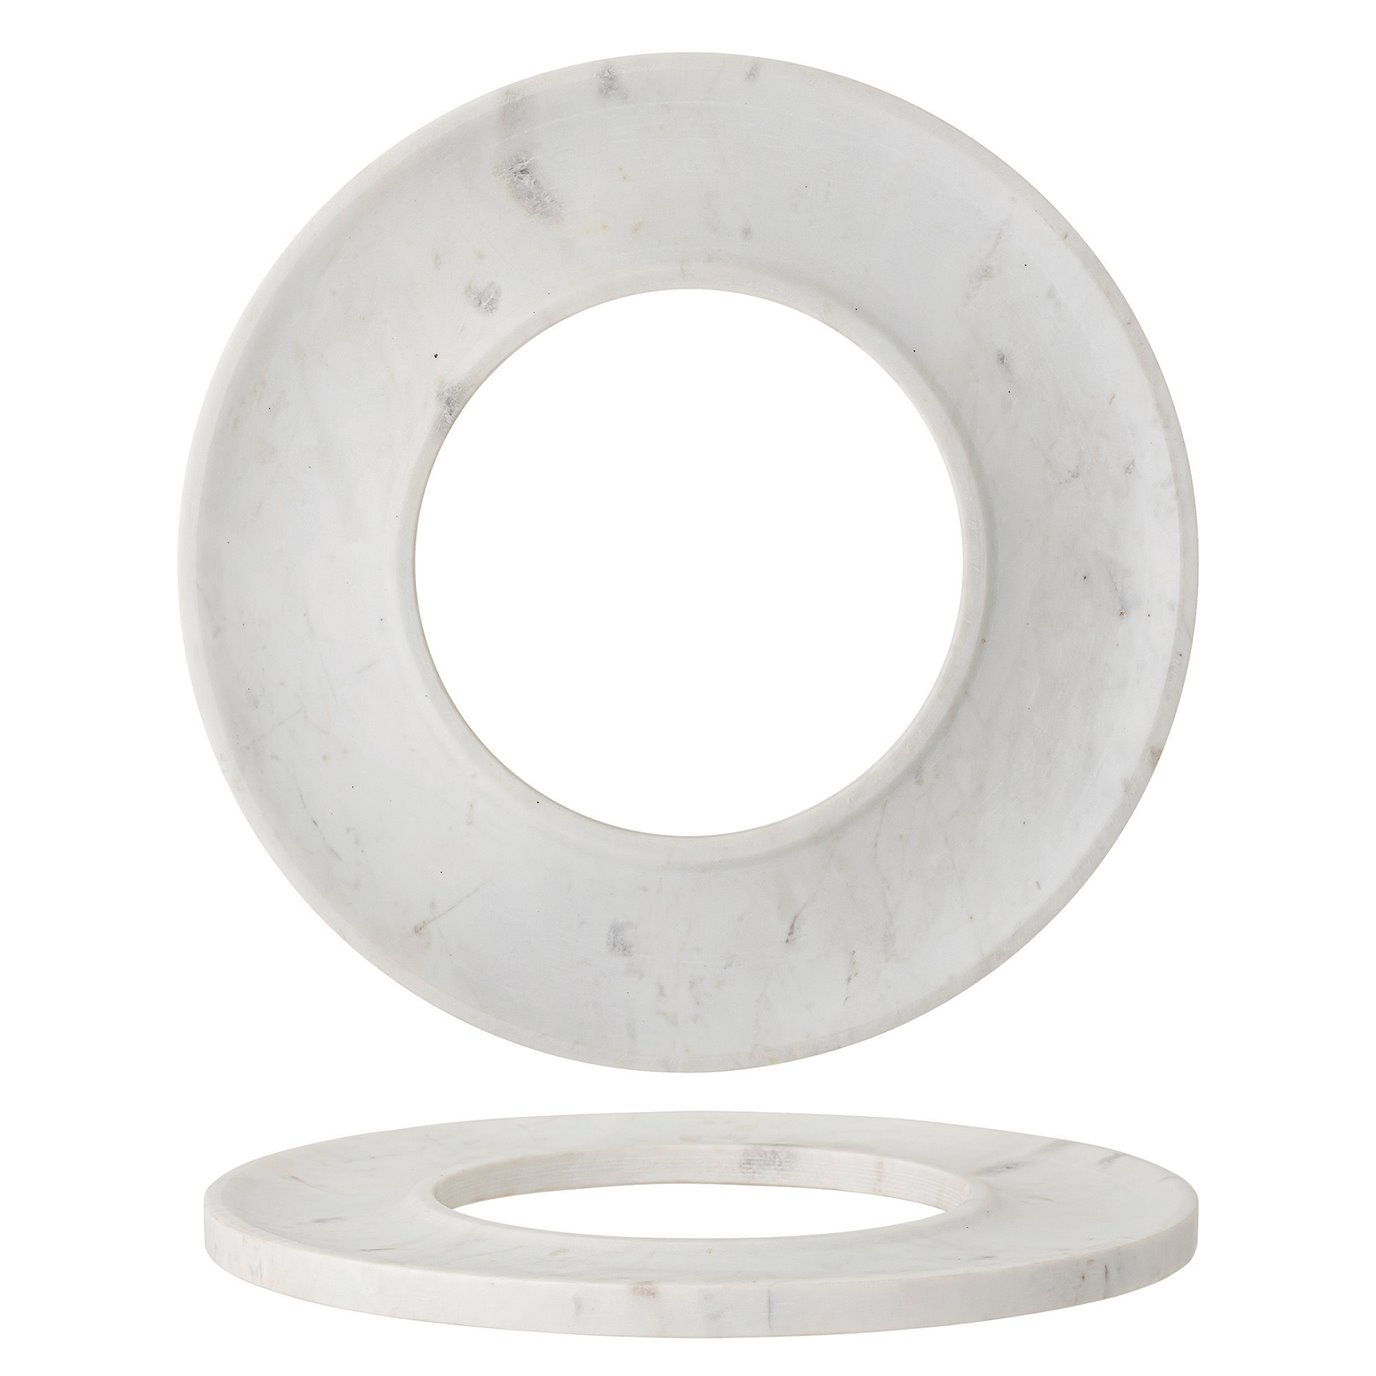 White Marble Circle Cracker/Cheese Tray